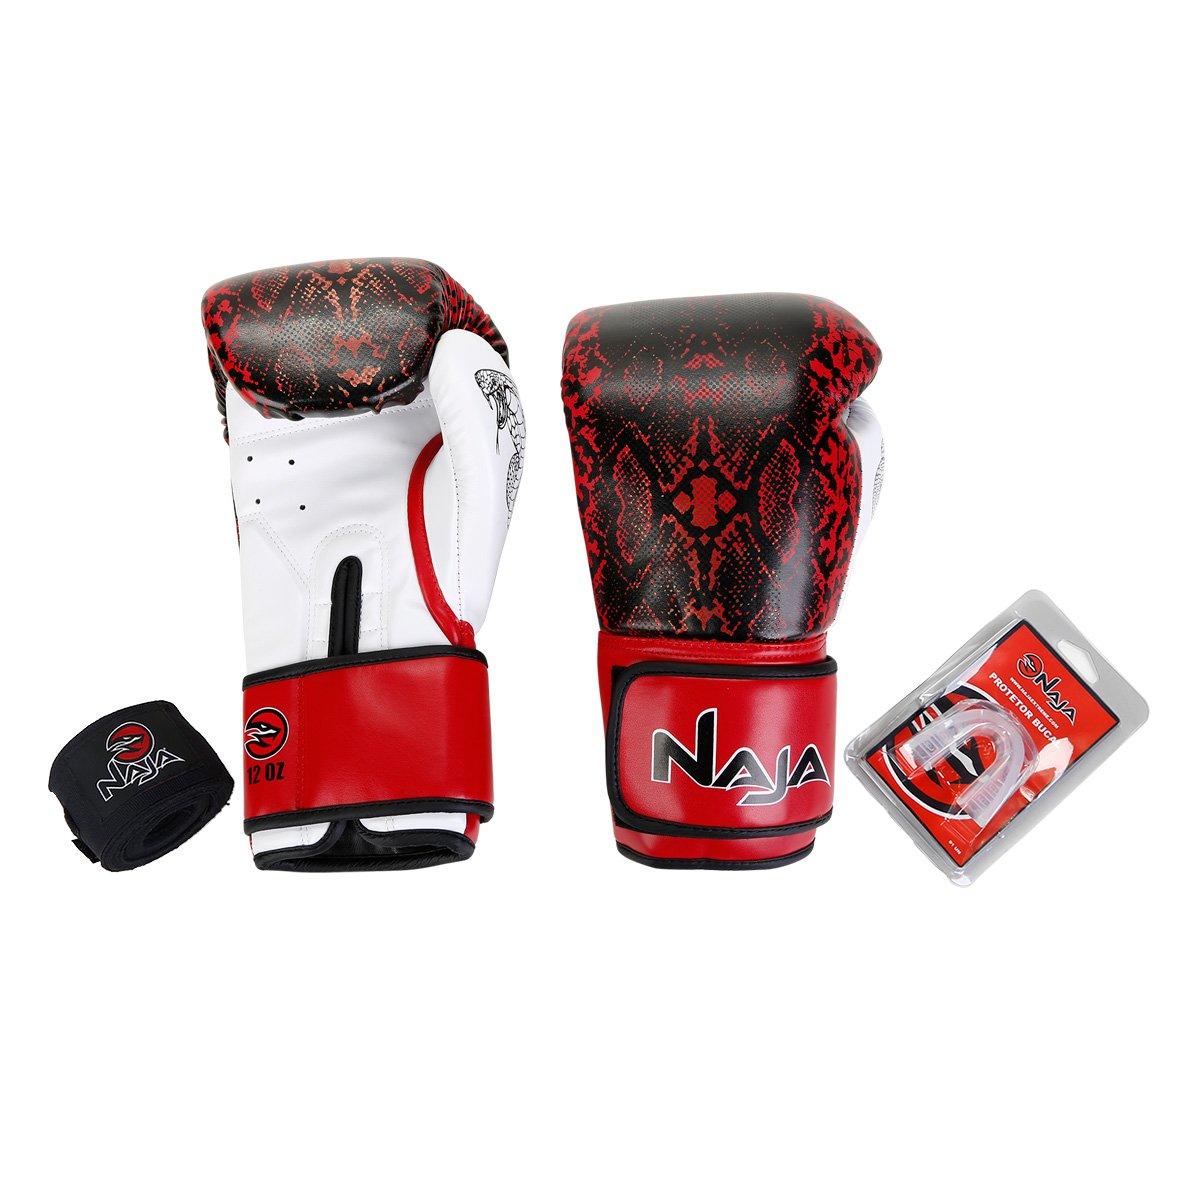 42d461526 Kit Naja Luva Boxe  Muay Thai Animal Print Cobra Luva Boxe 12 Oz + Bandagem  + Protetor Bucal - Vermelho